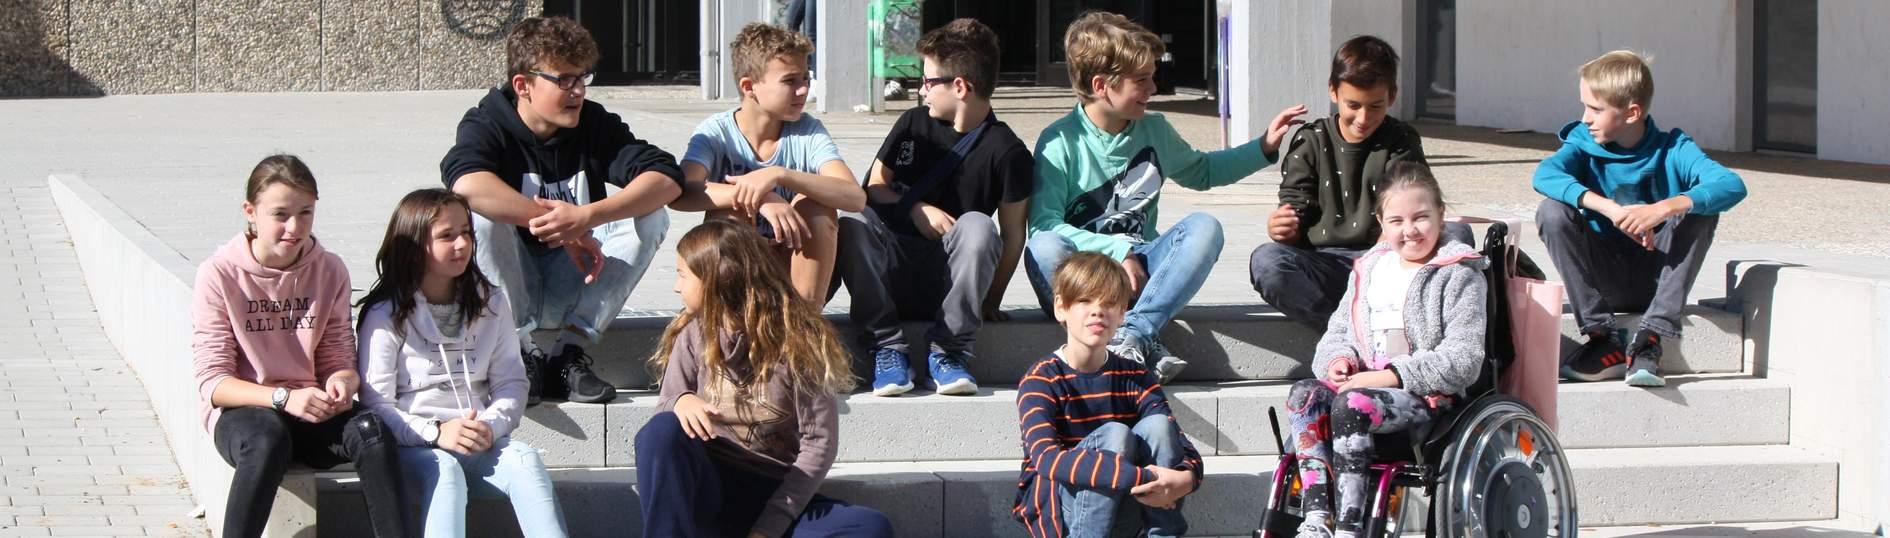 Unsere Schule in Bad Wimpfen